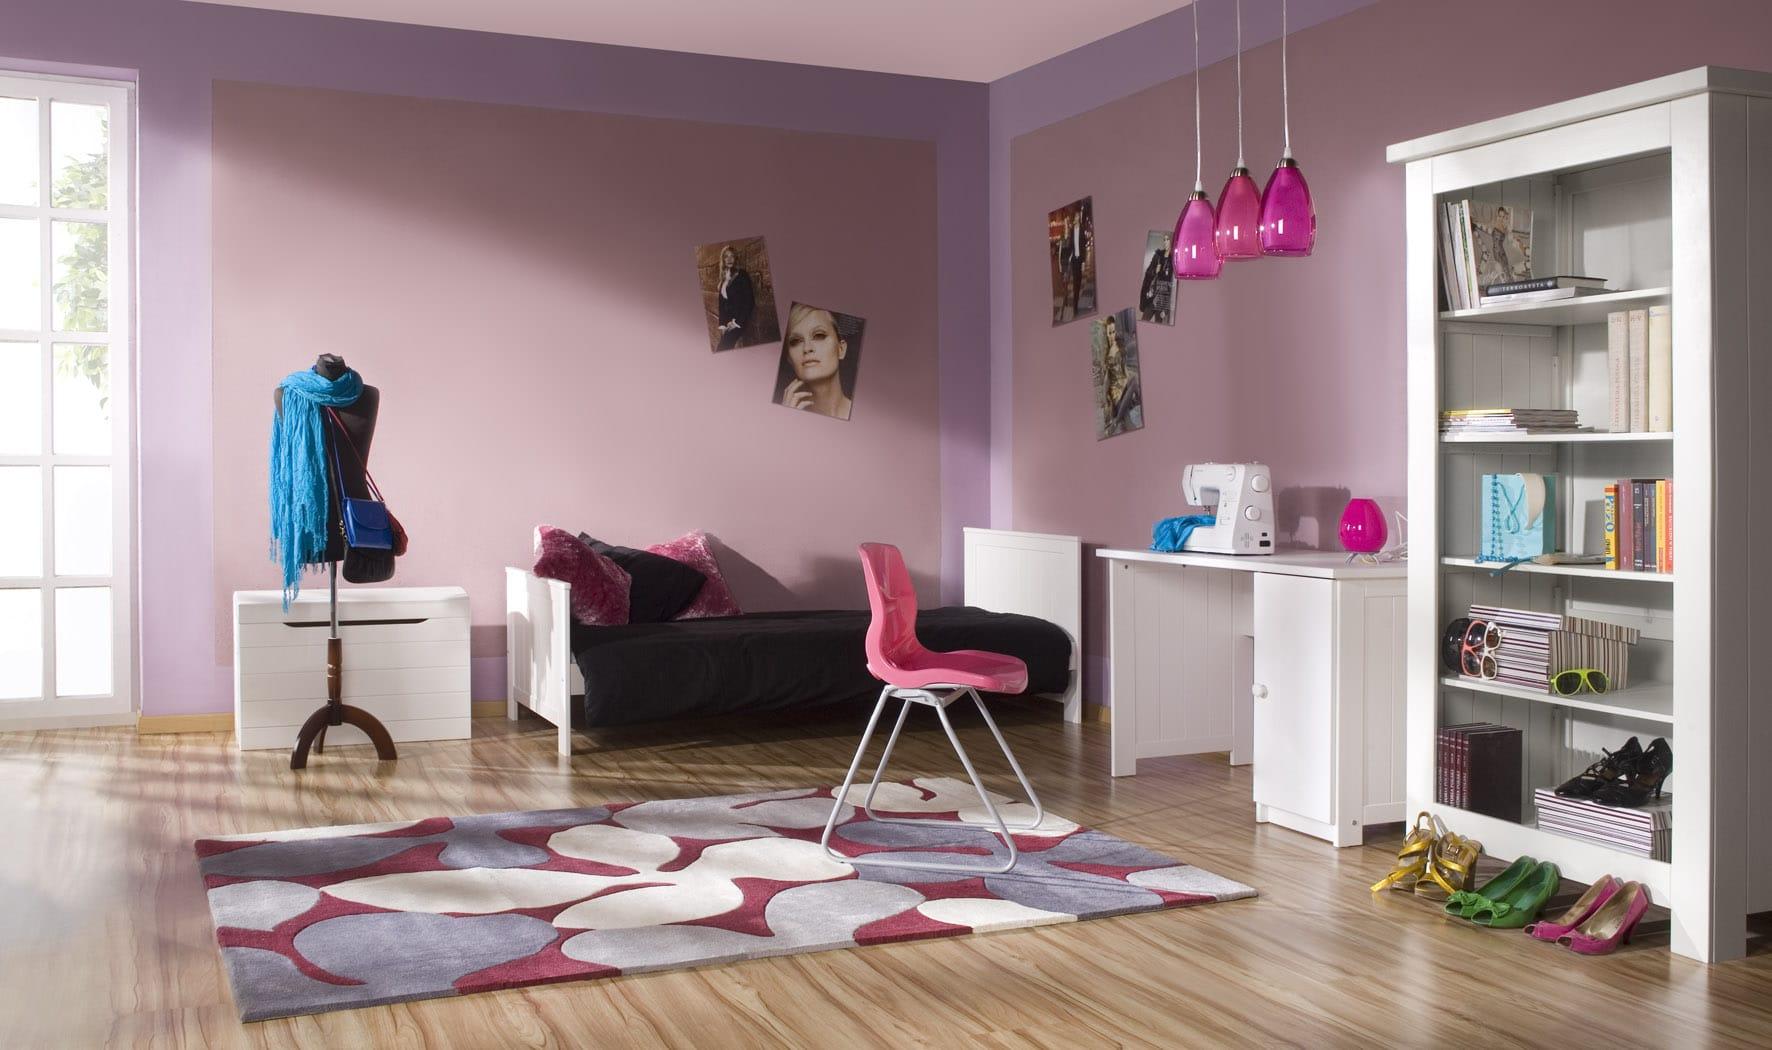 PINIO Barcelona - 5 meubles - lit 160x70, commode, armoire 2 ou 4 portes,  grande bibliothèque, bureau